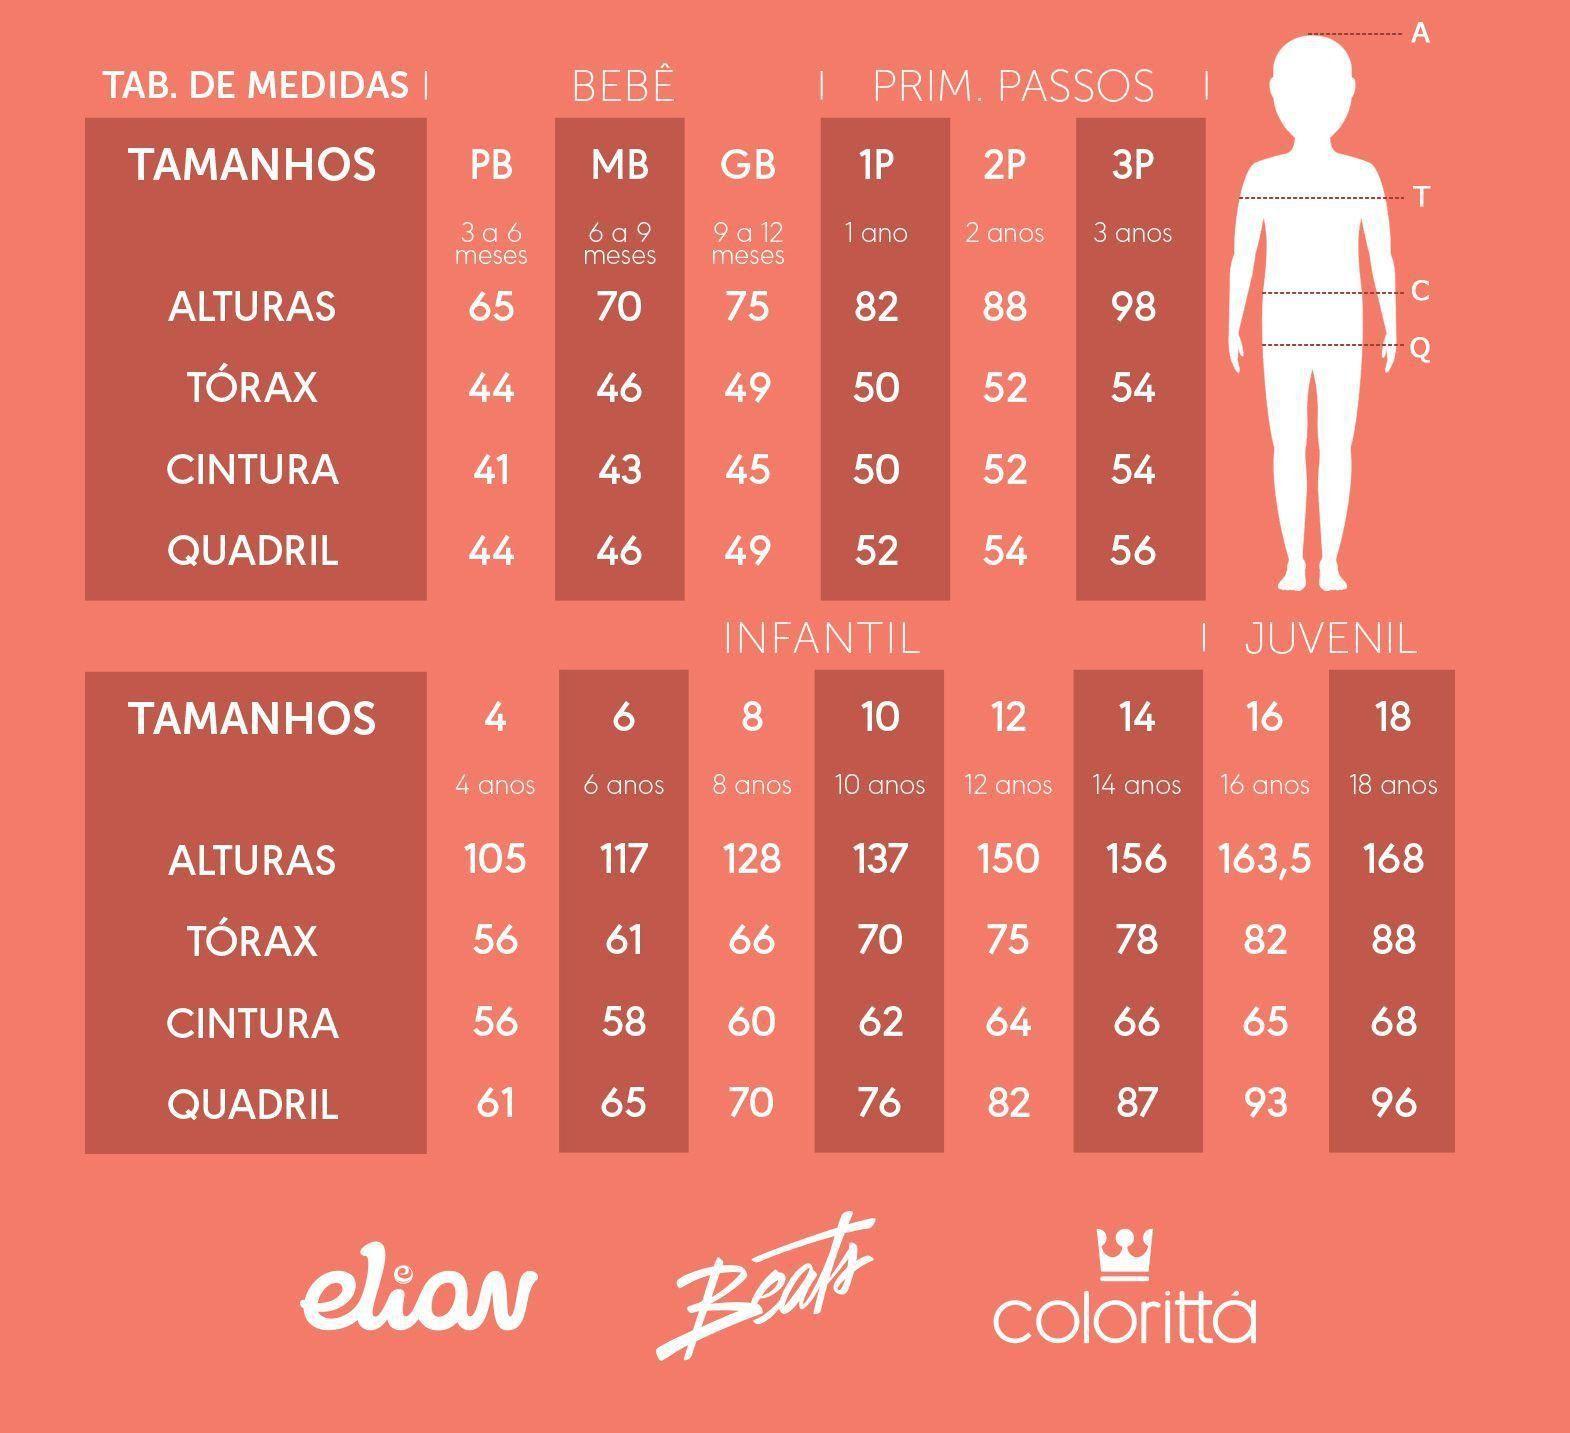 Legging Infantil Feminina Preto Urban - Elian: Tabela de medidas